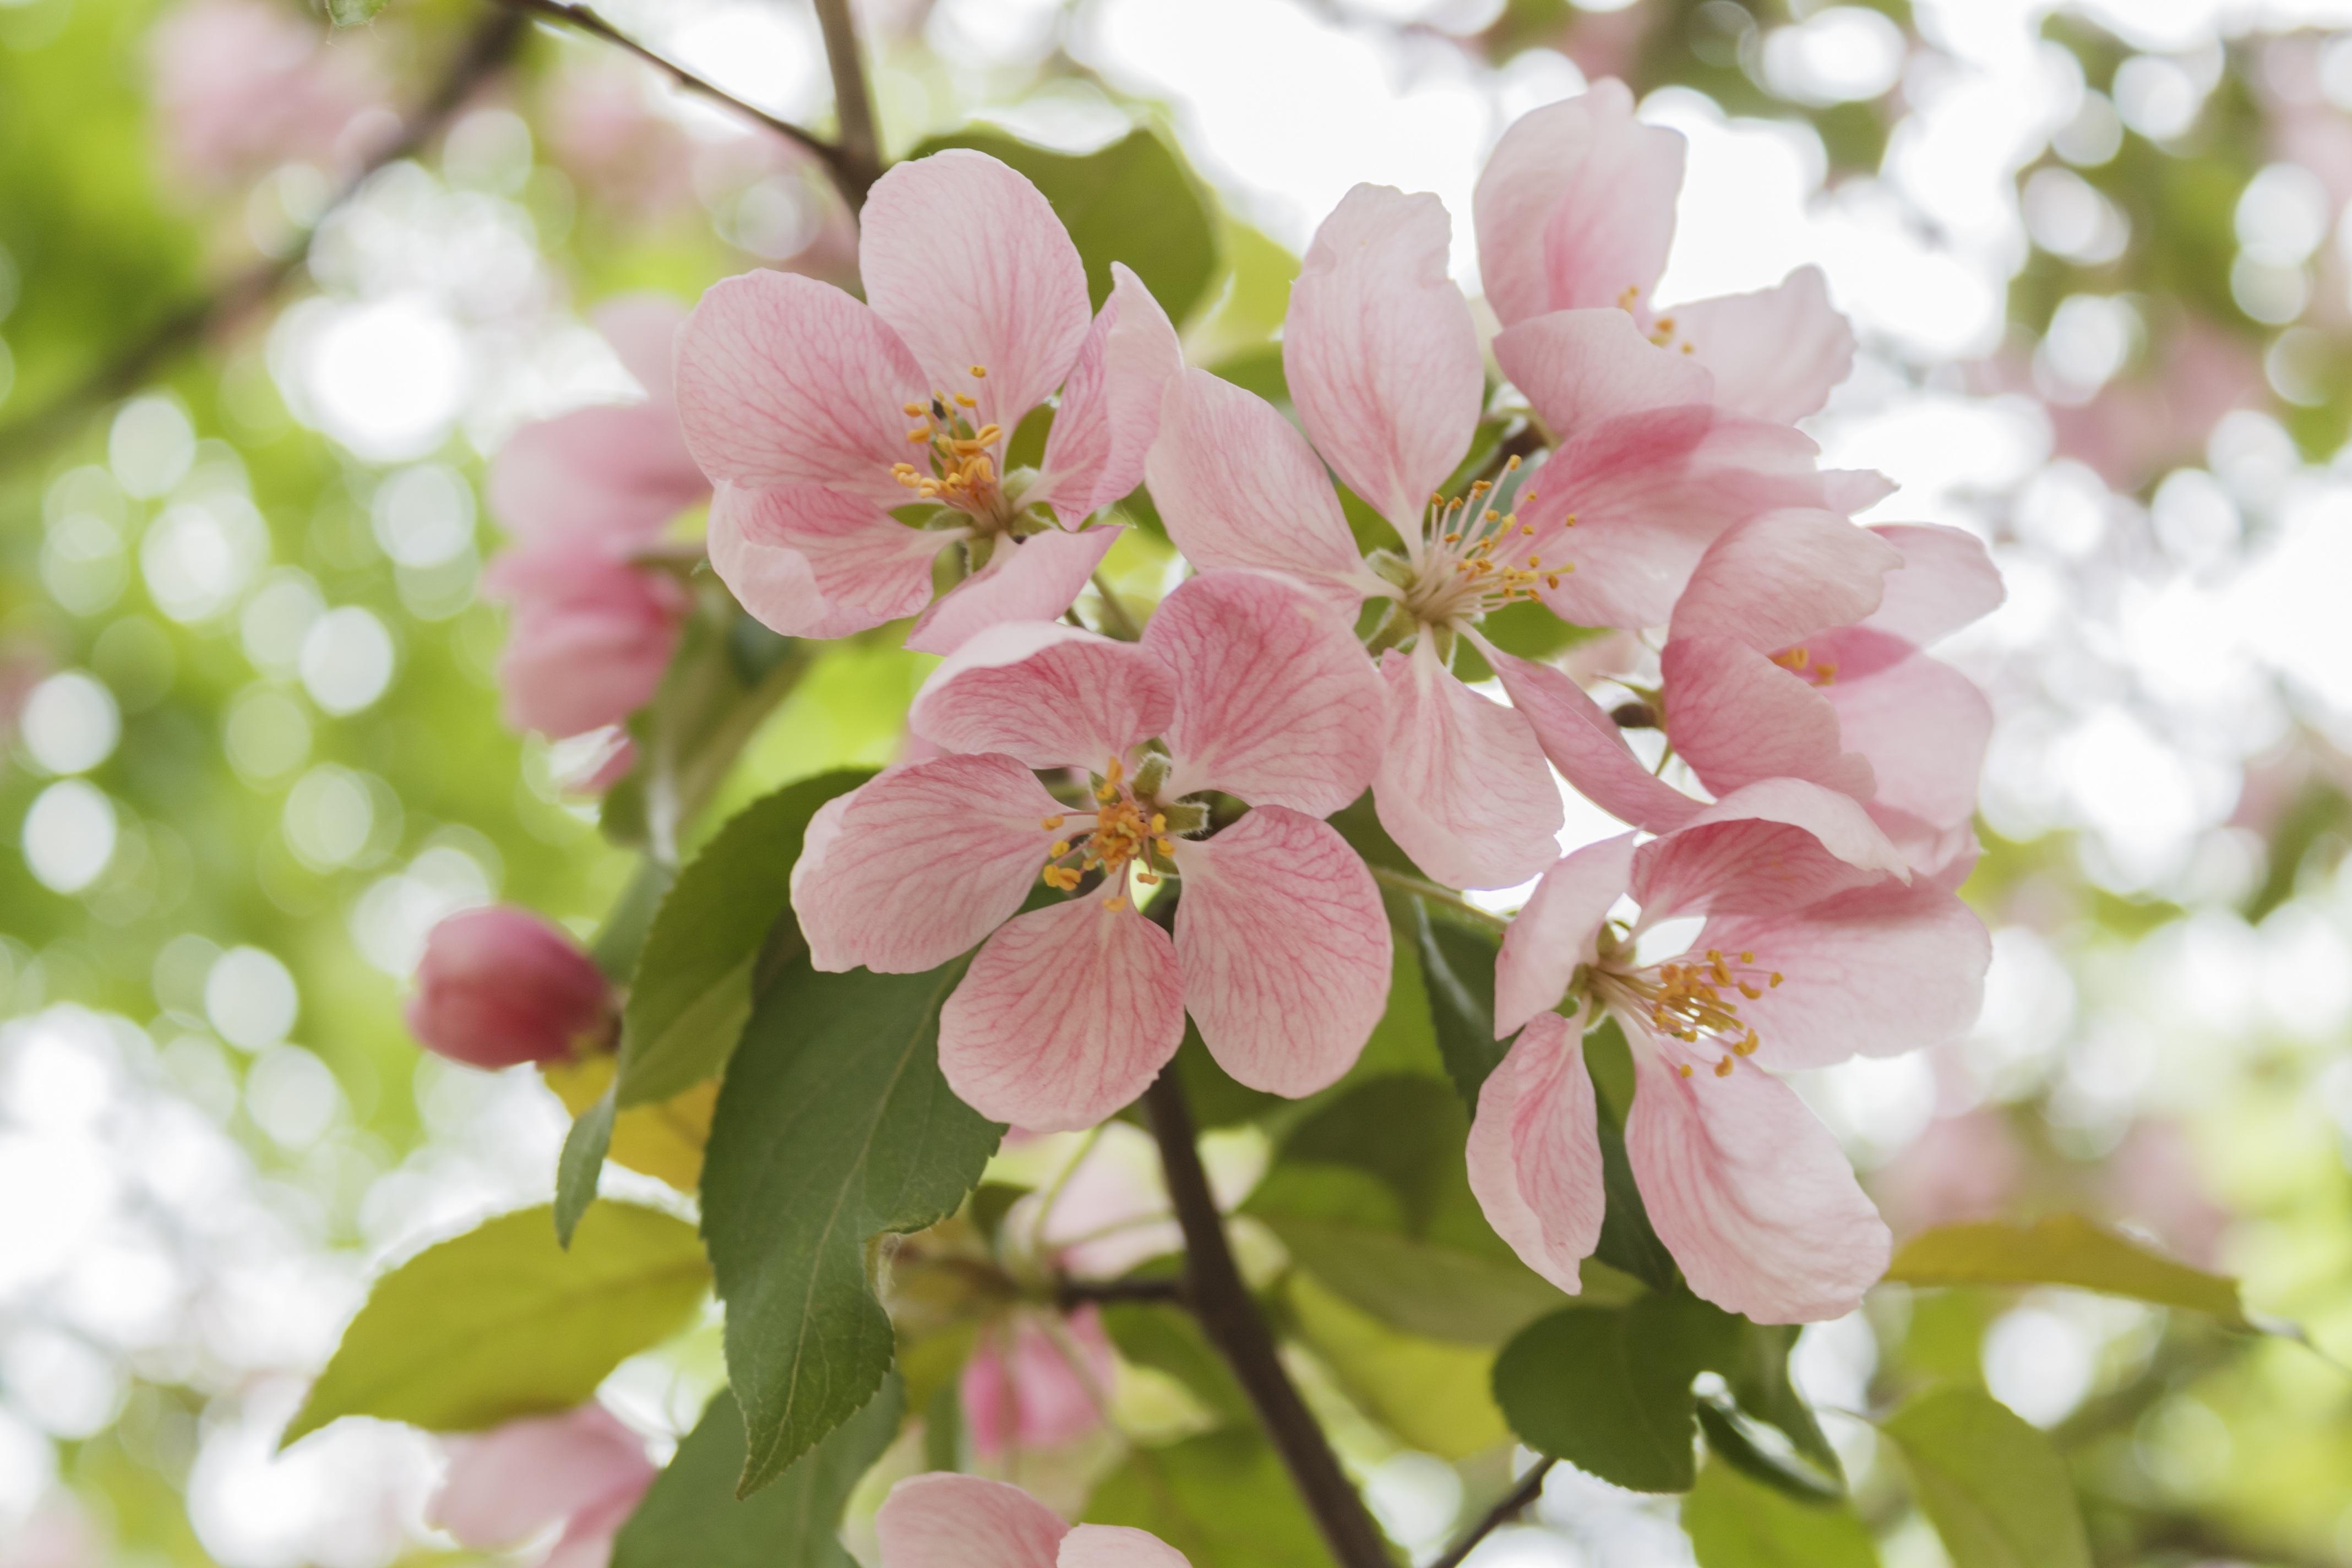 Free Images Branch Petal Bloom Food Spring Produce Botany